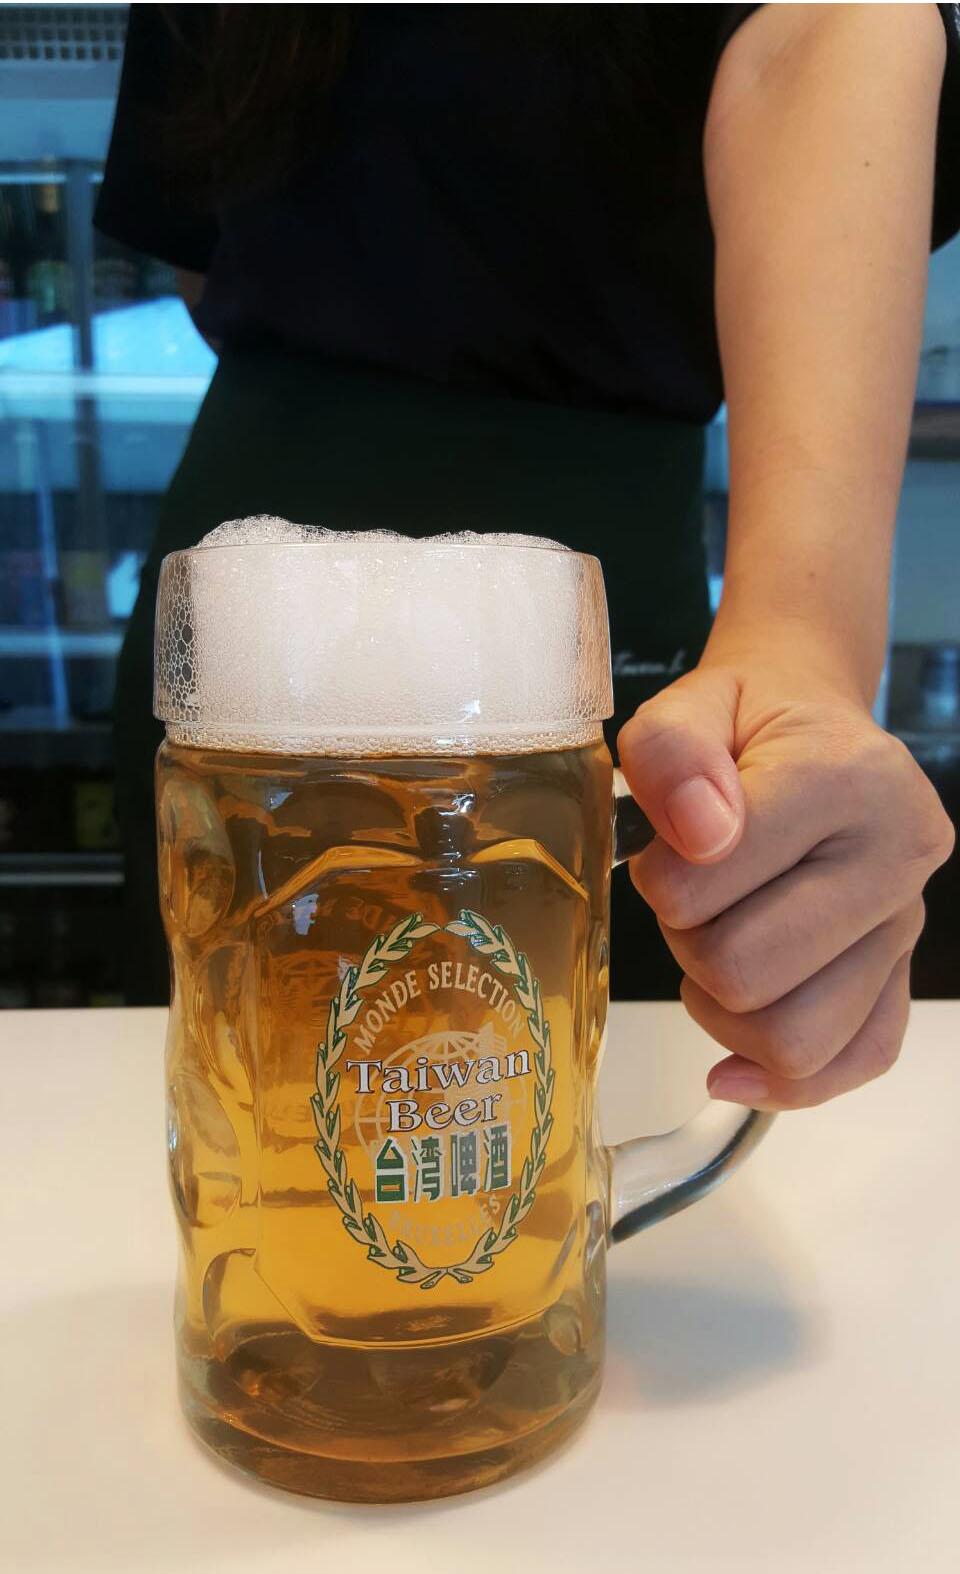 Tavern L Hostel 客棧田僑 青年旅館 : 臺灣啤酒Taiwan beer